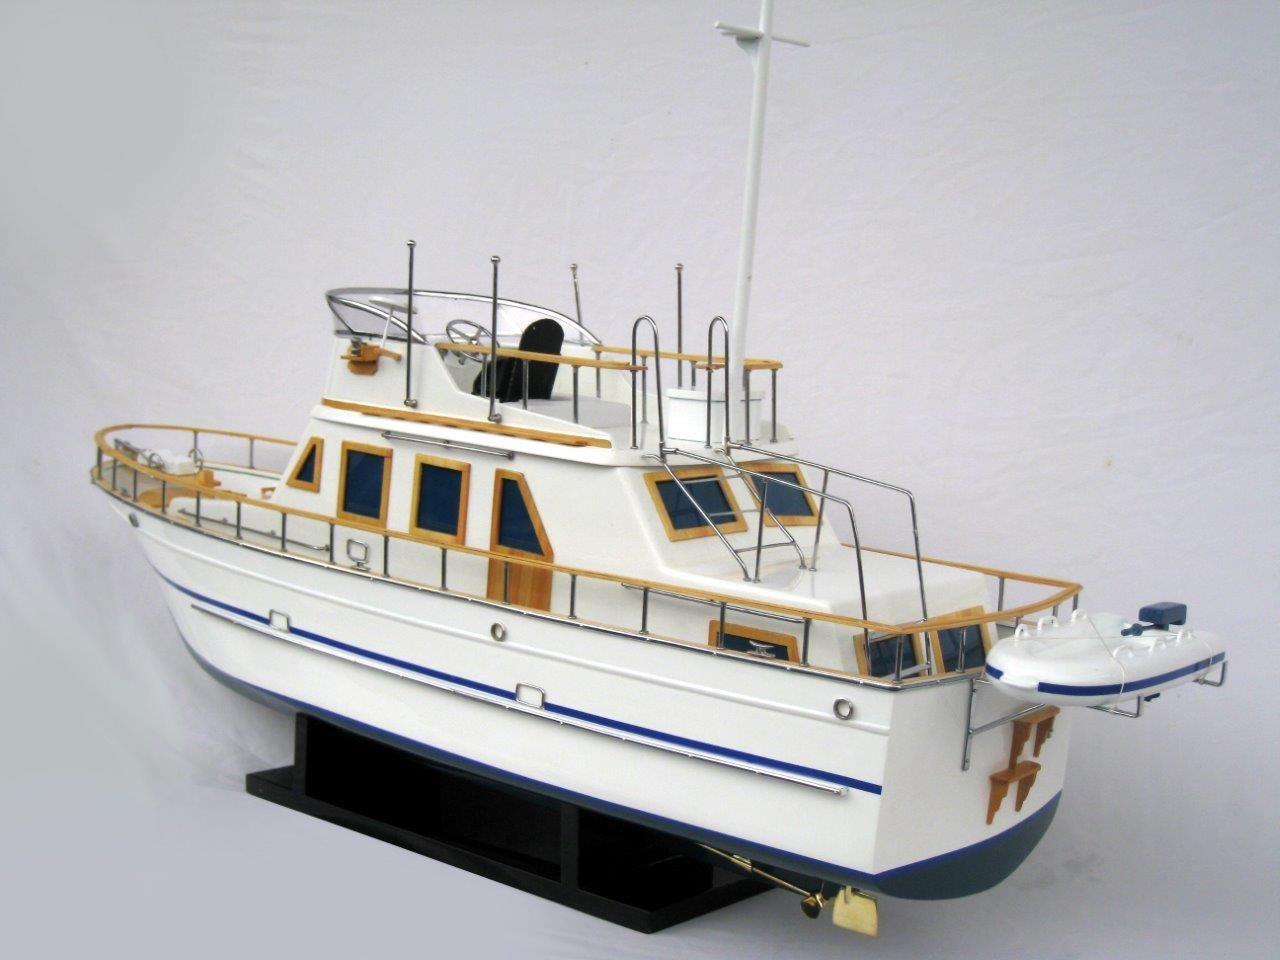 2092-12426-Reinee-Roo-Model-Ship